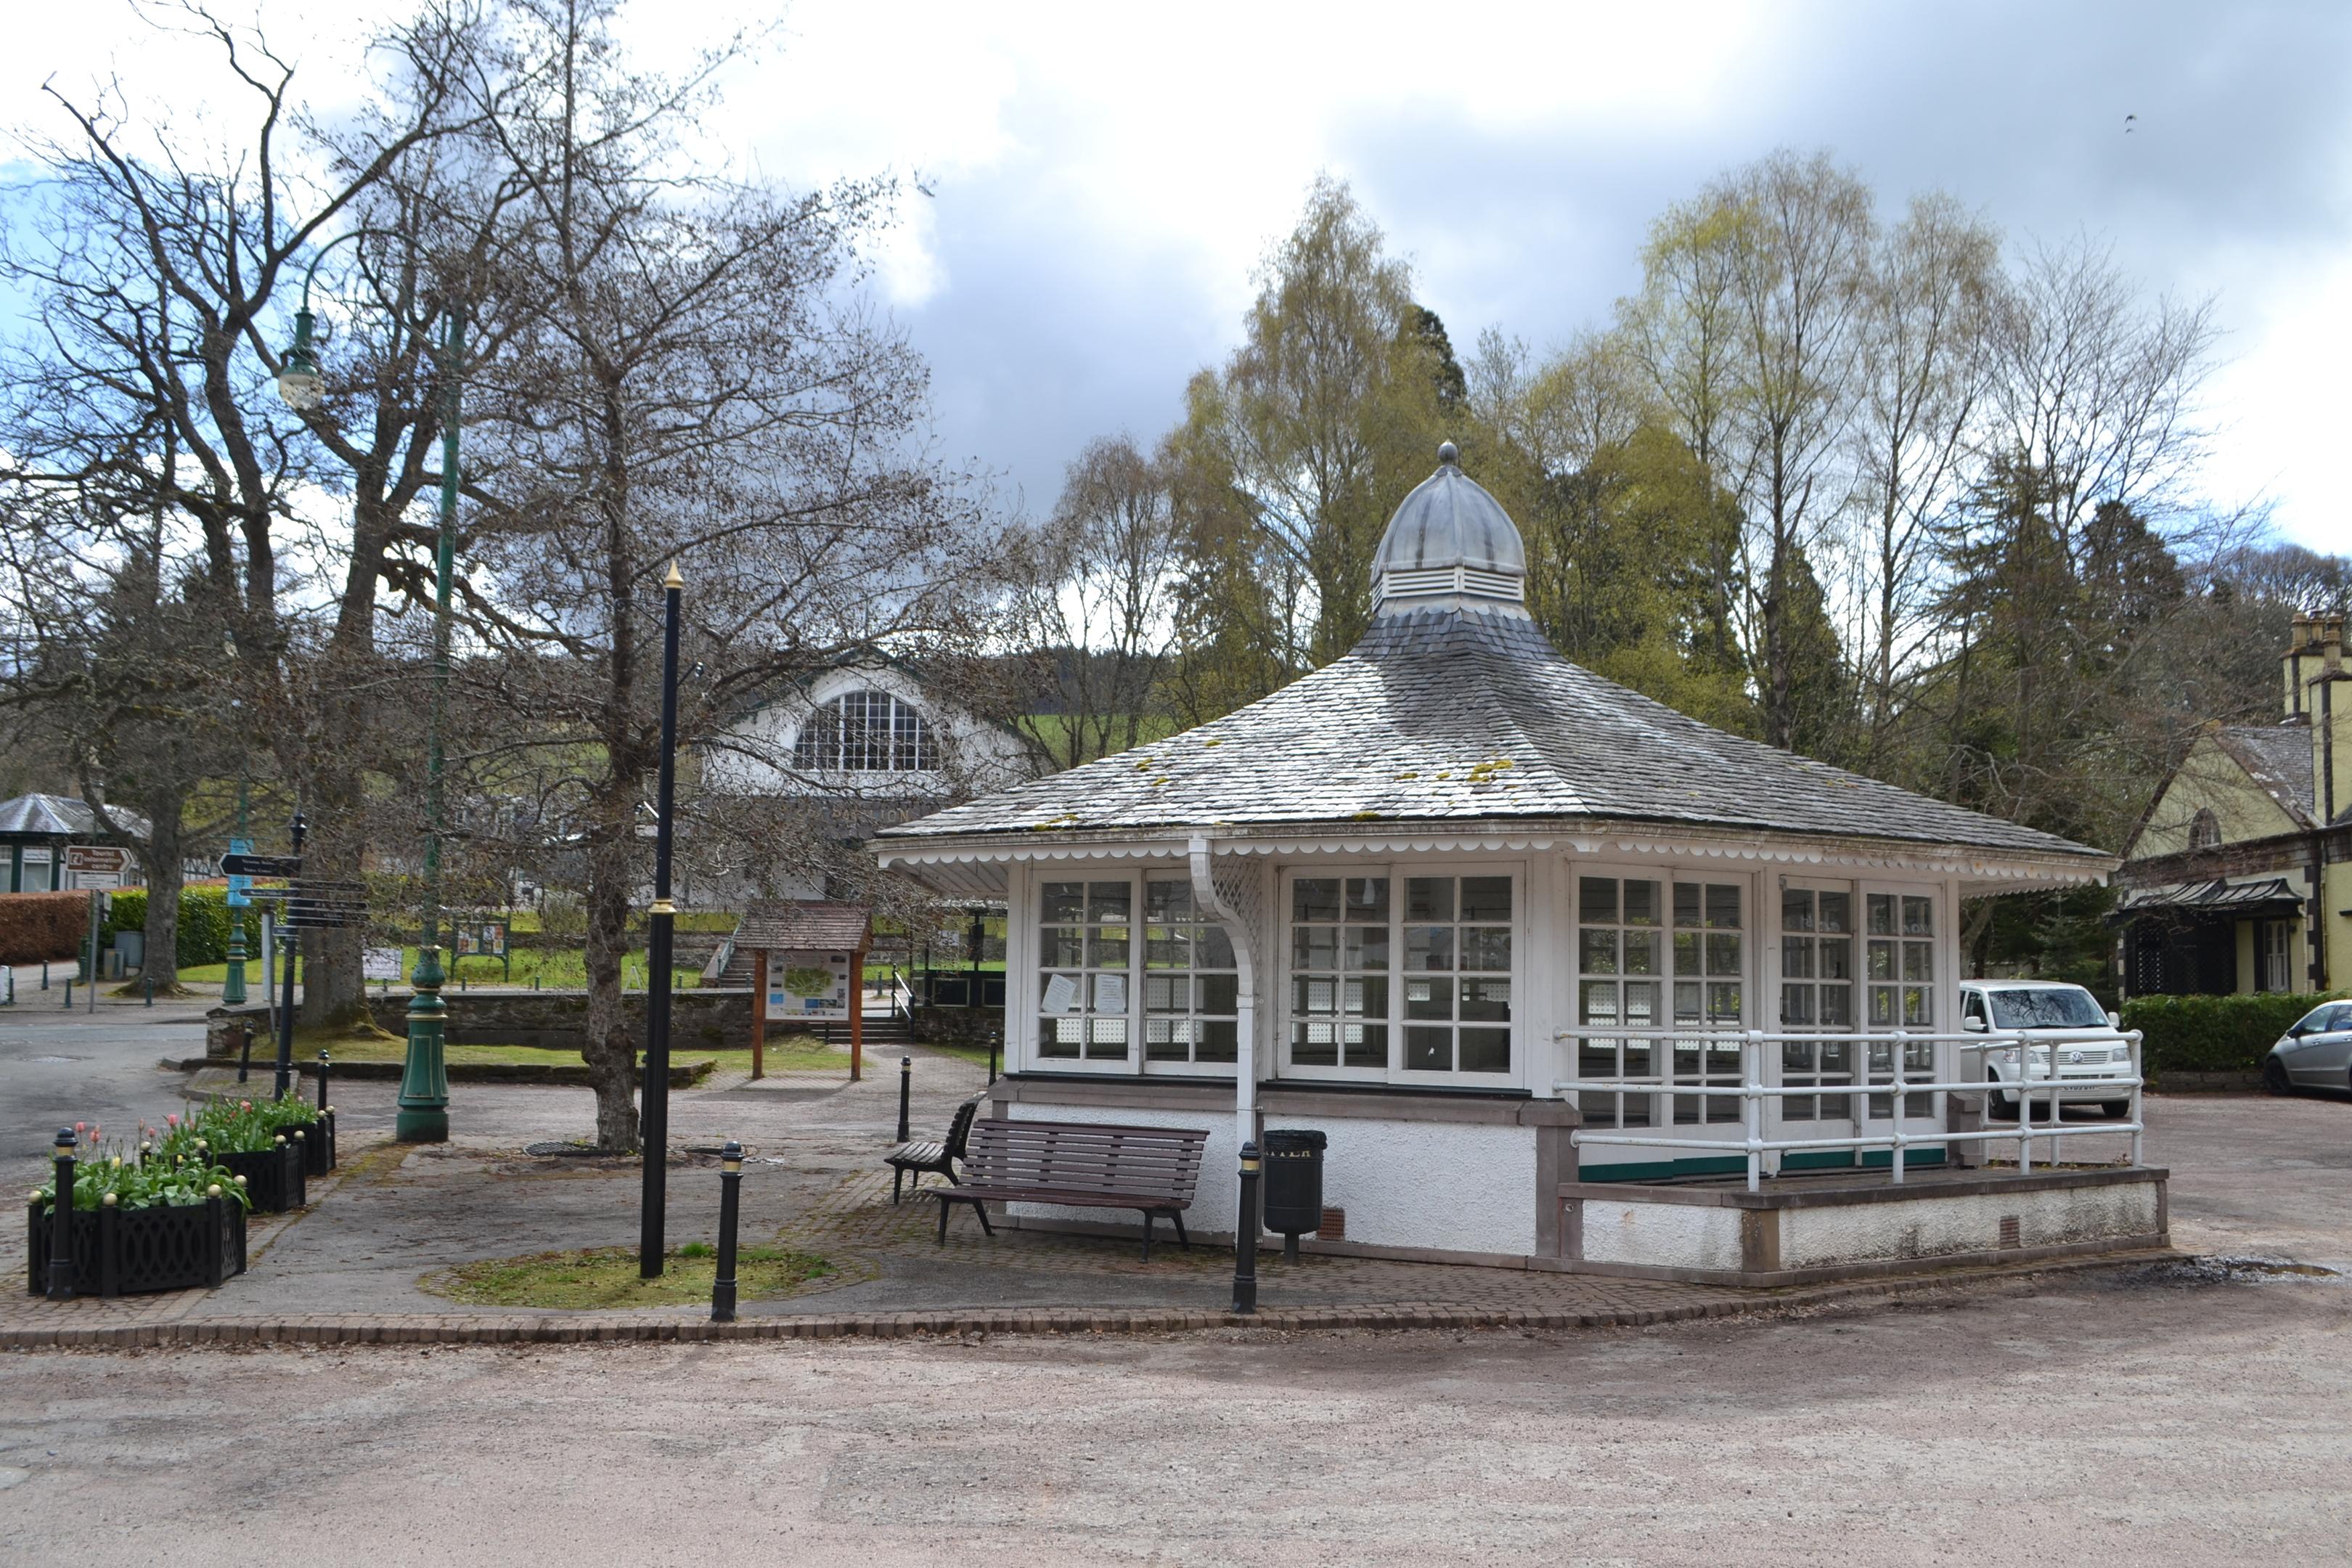 The former water sampling pavilion in Strathpeffer